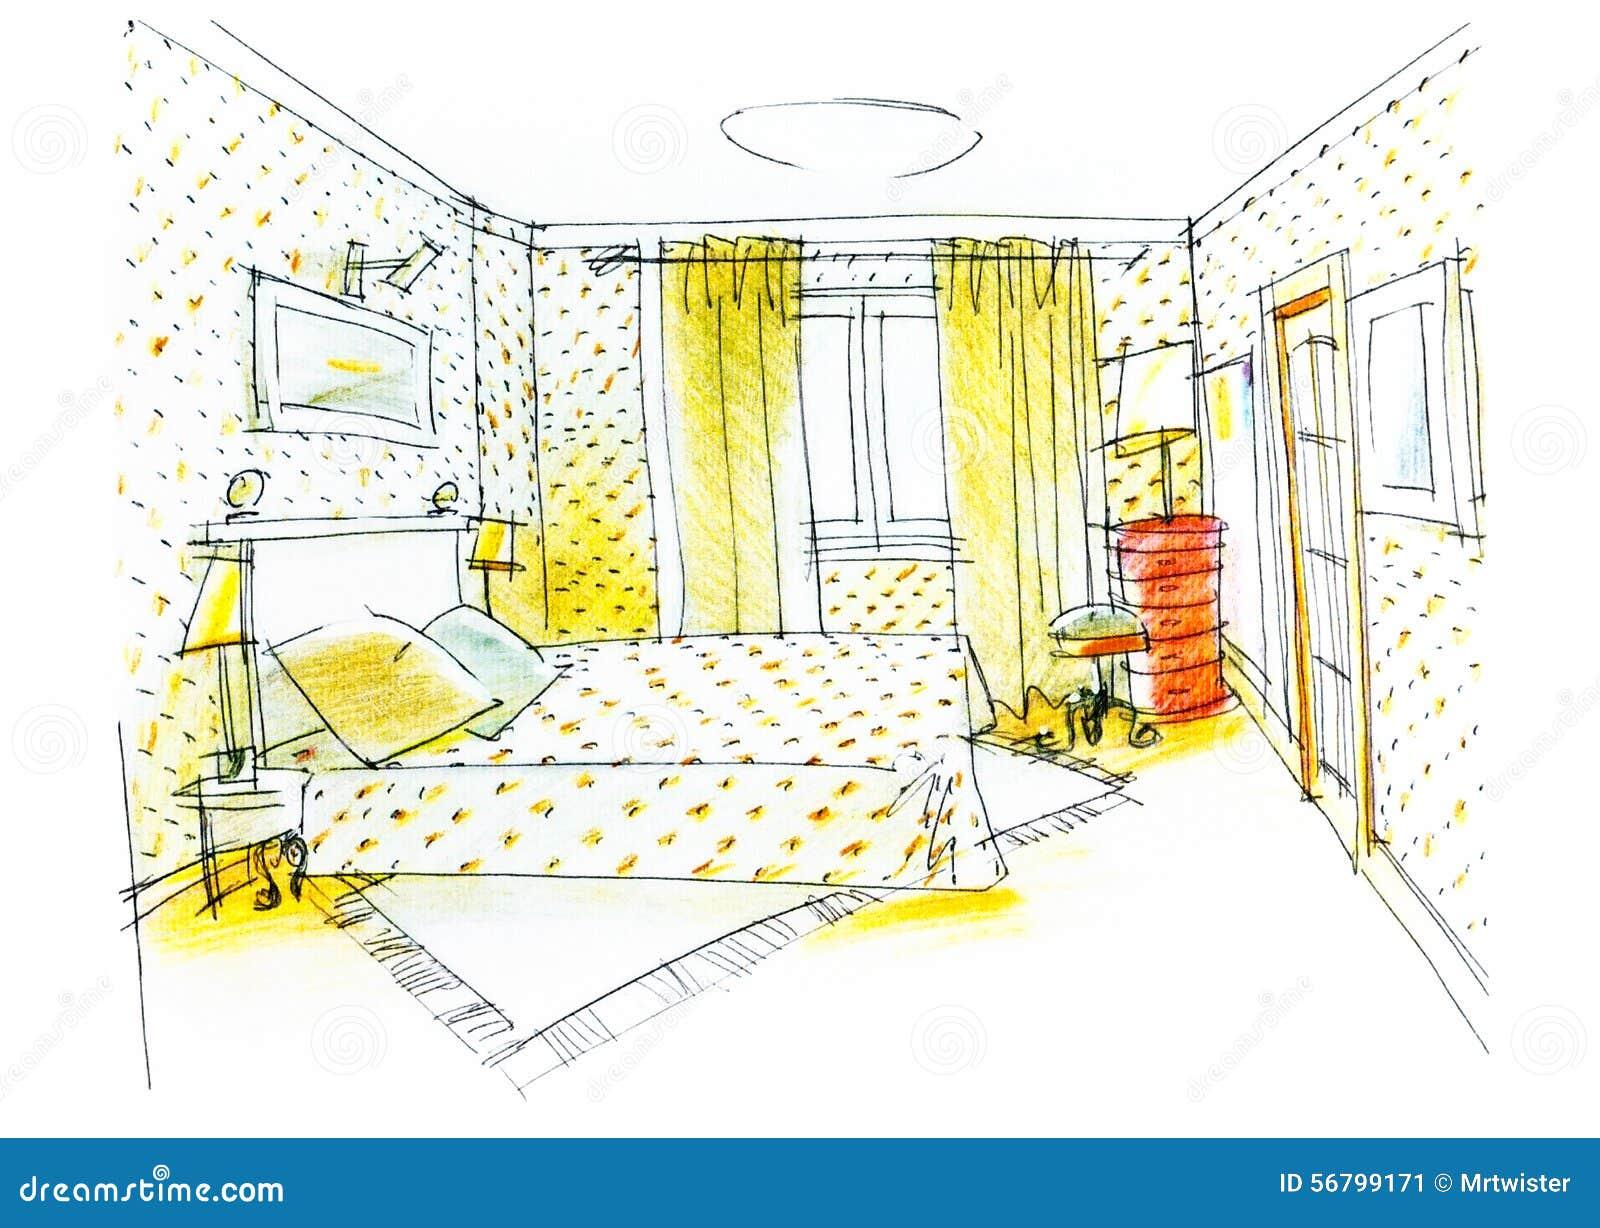 Chambre a coucher dwg for Agencement de chambre a coucher